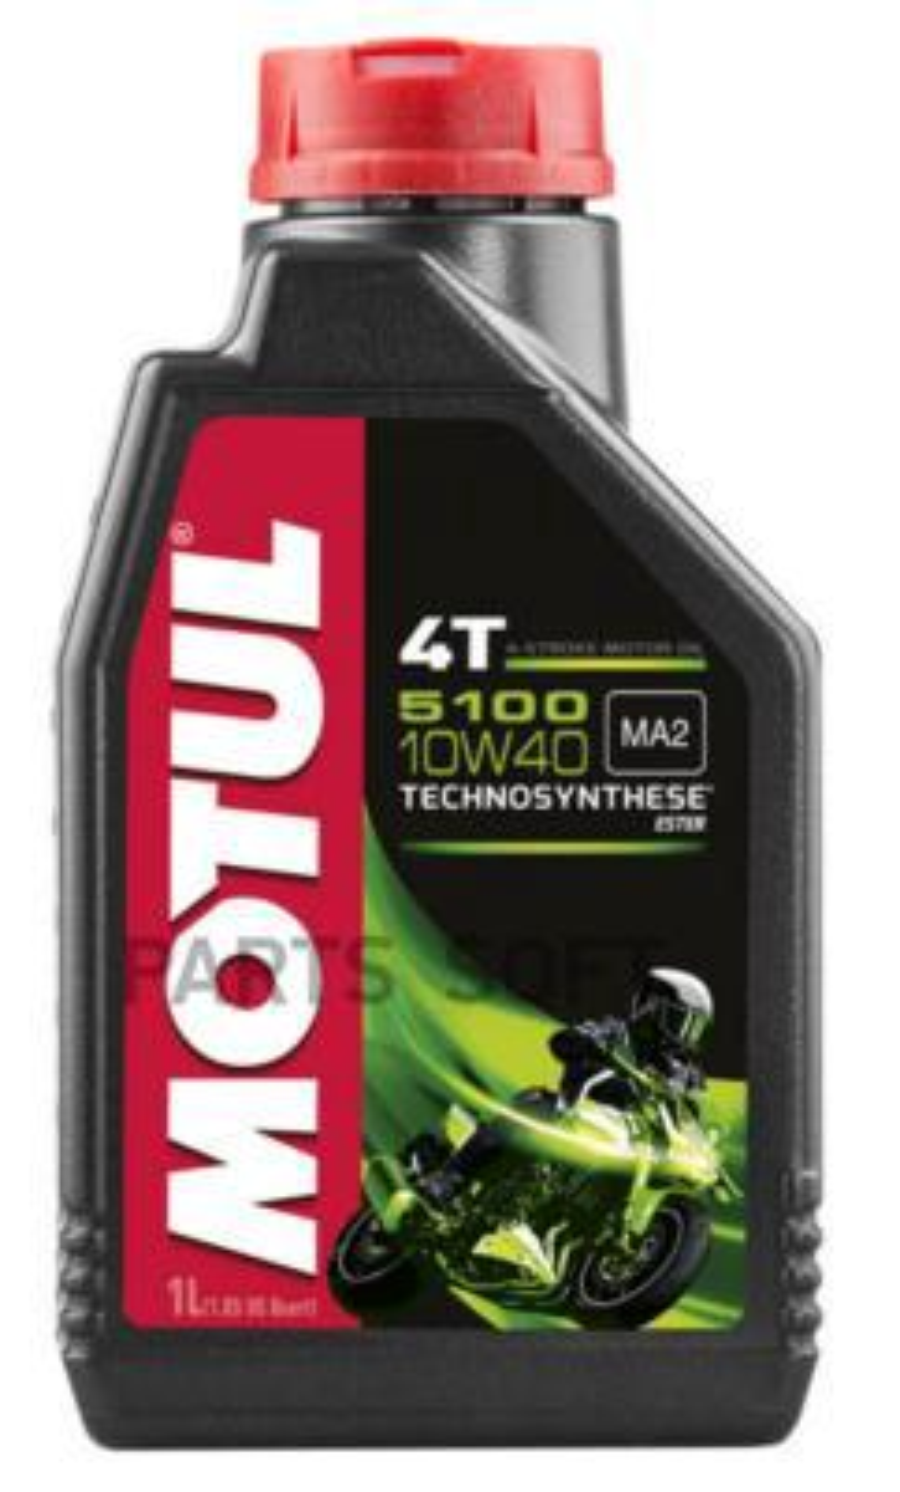 Масло моторное полусинтетическое 5100 4T 10W-40, 1л